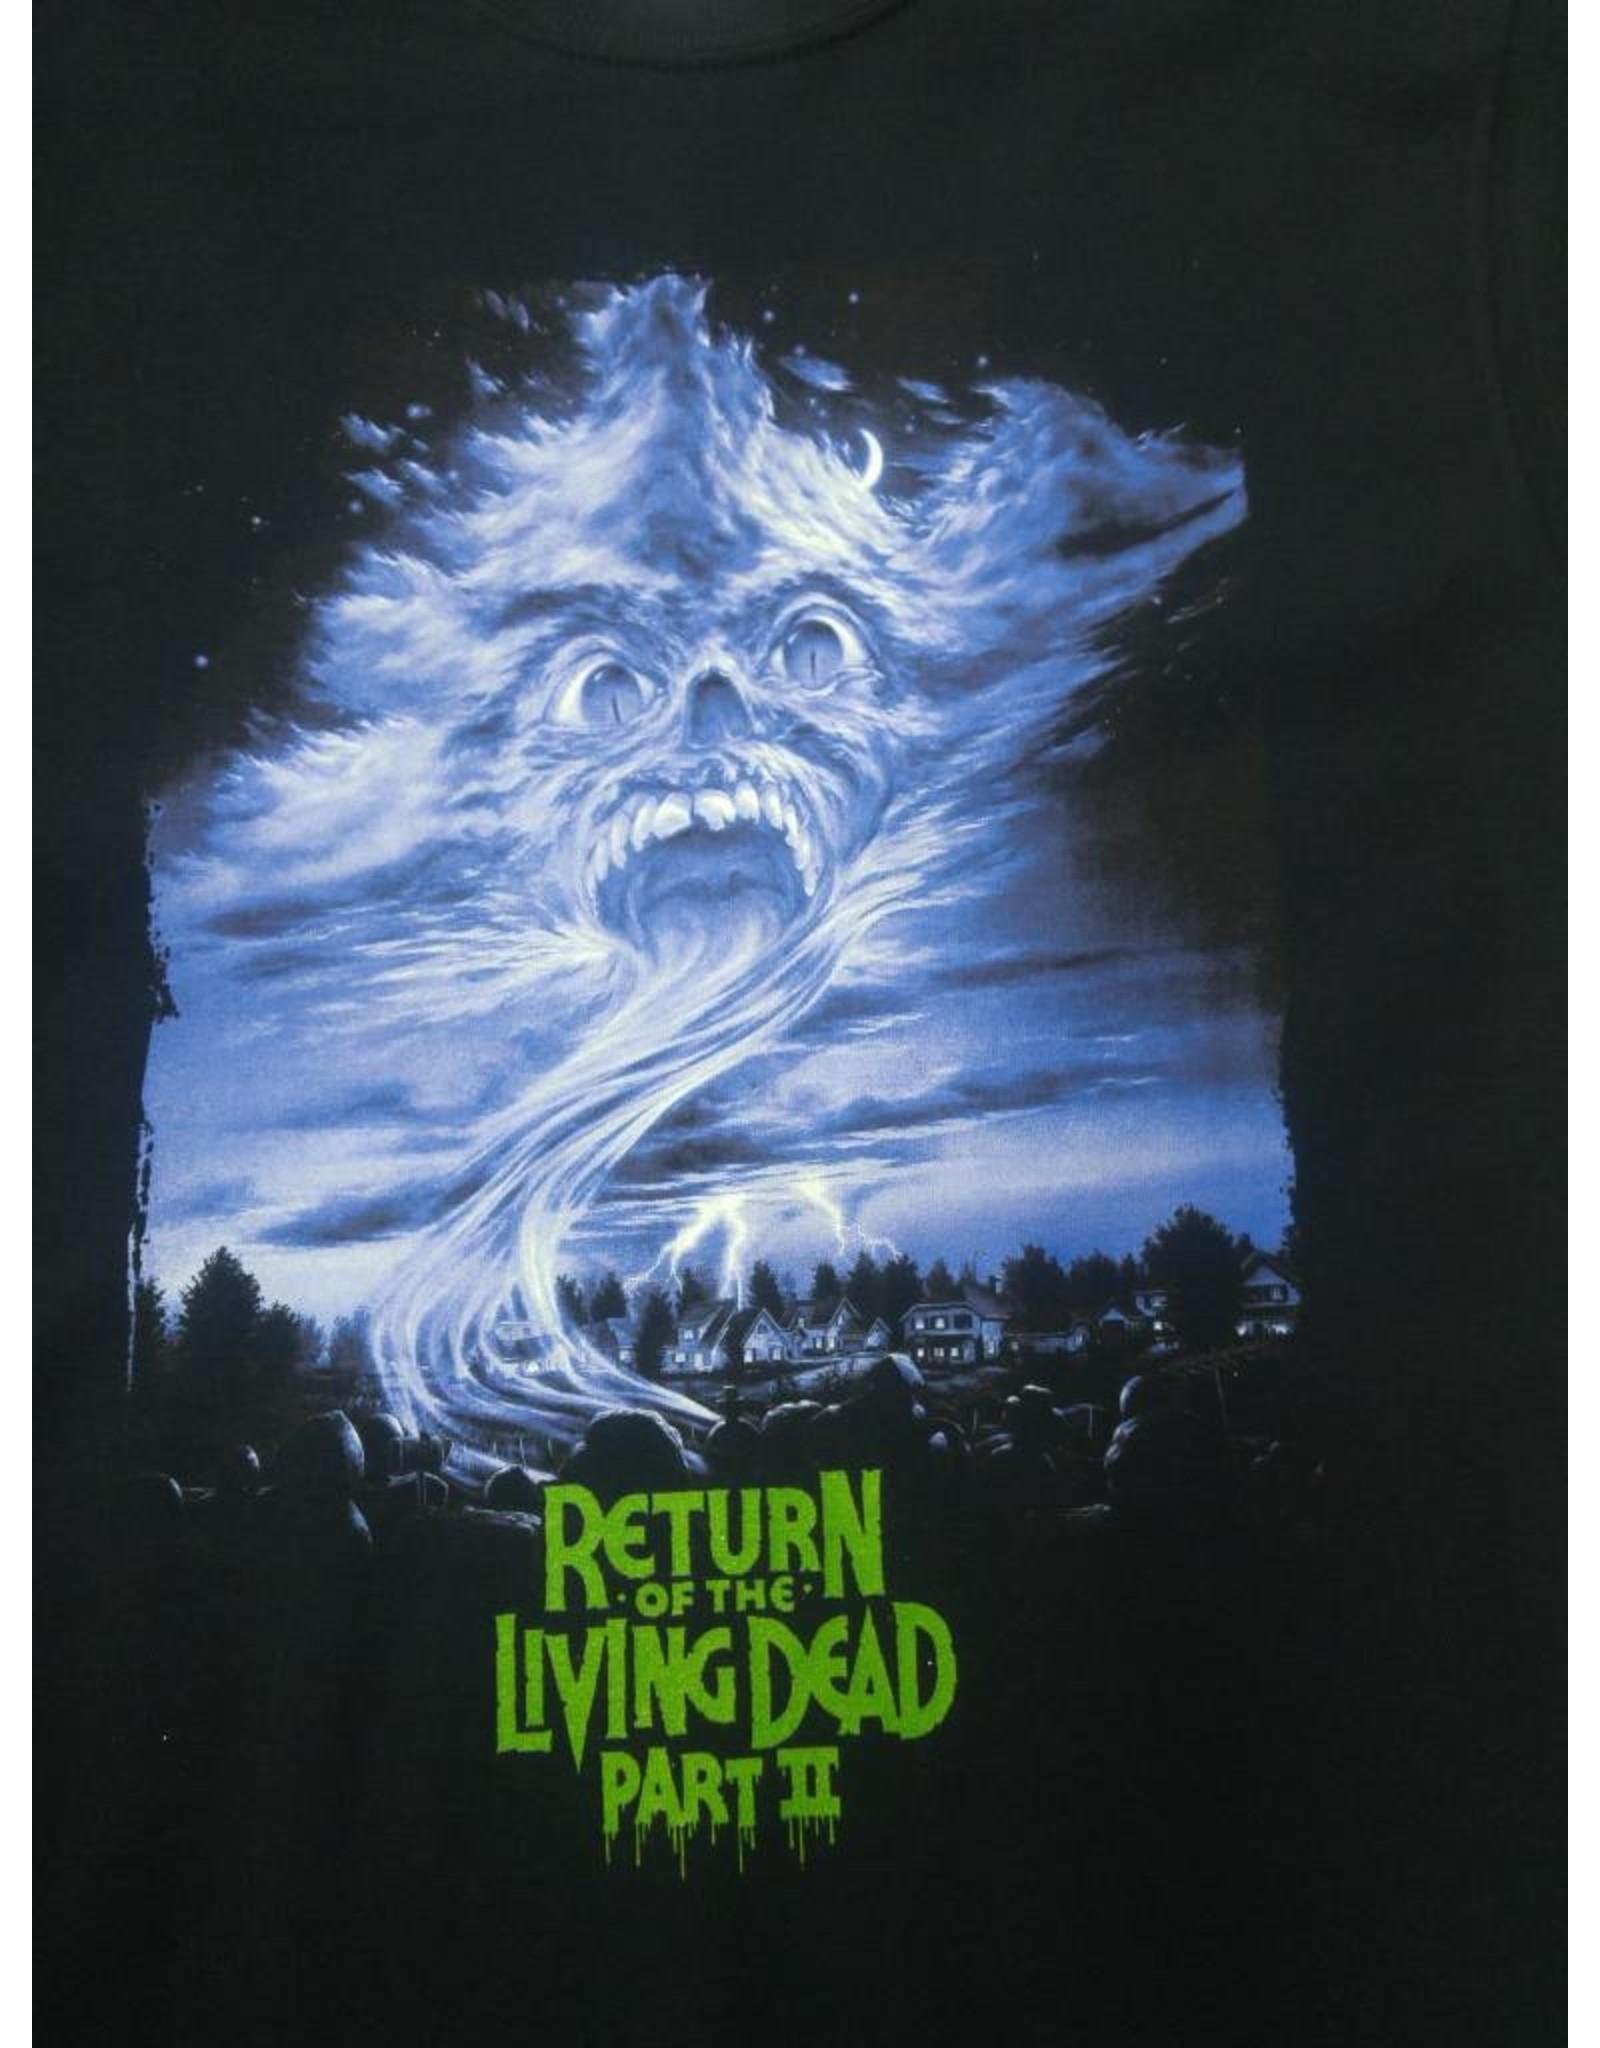 Return of the Living Dead Part II Shirt